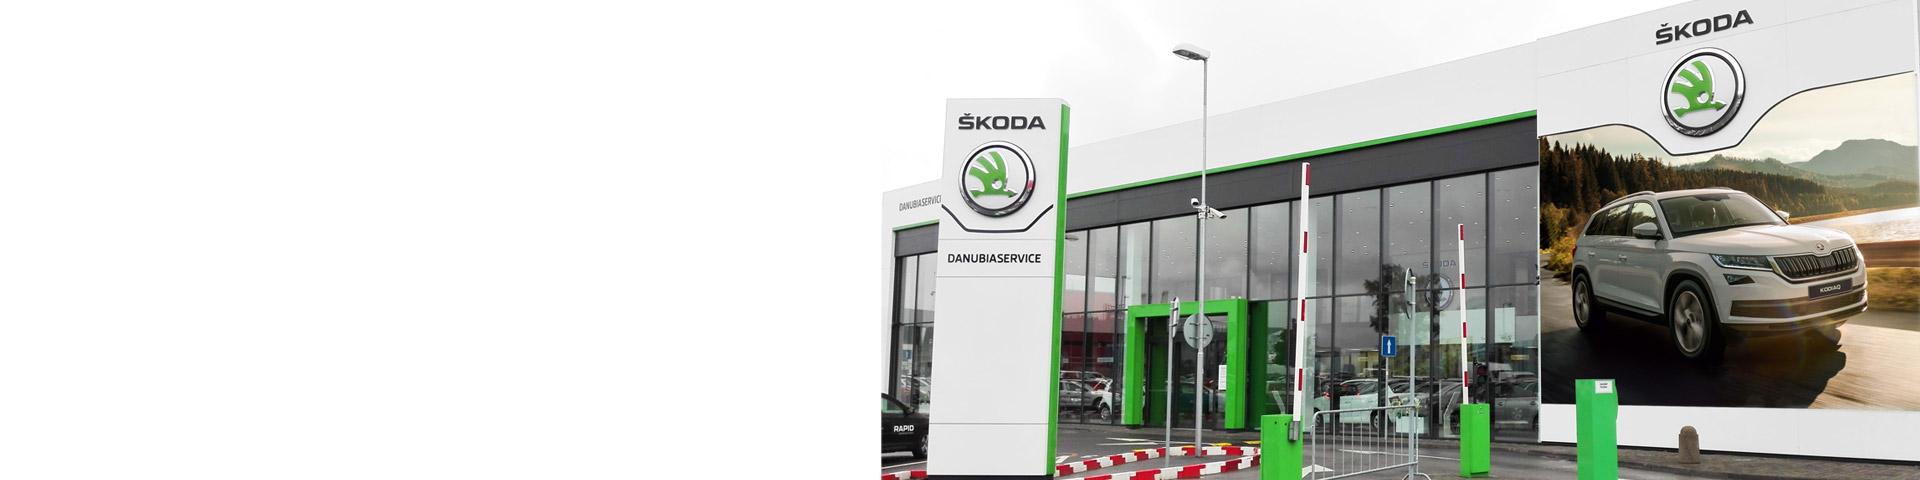 showroom_skoda-1